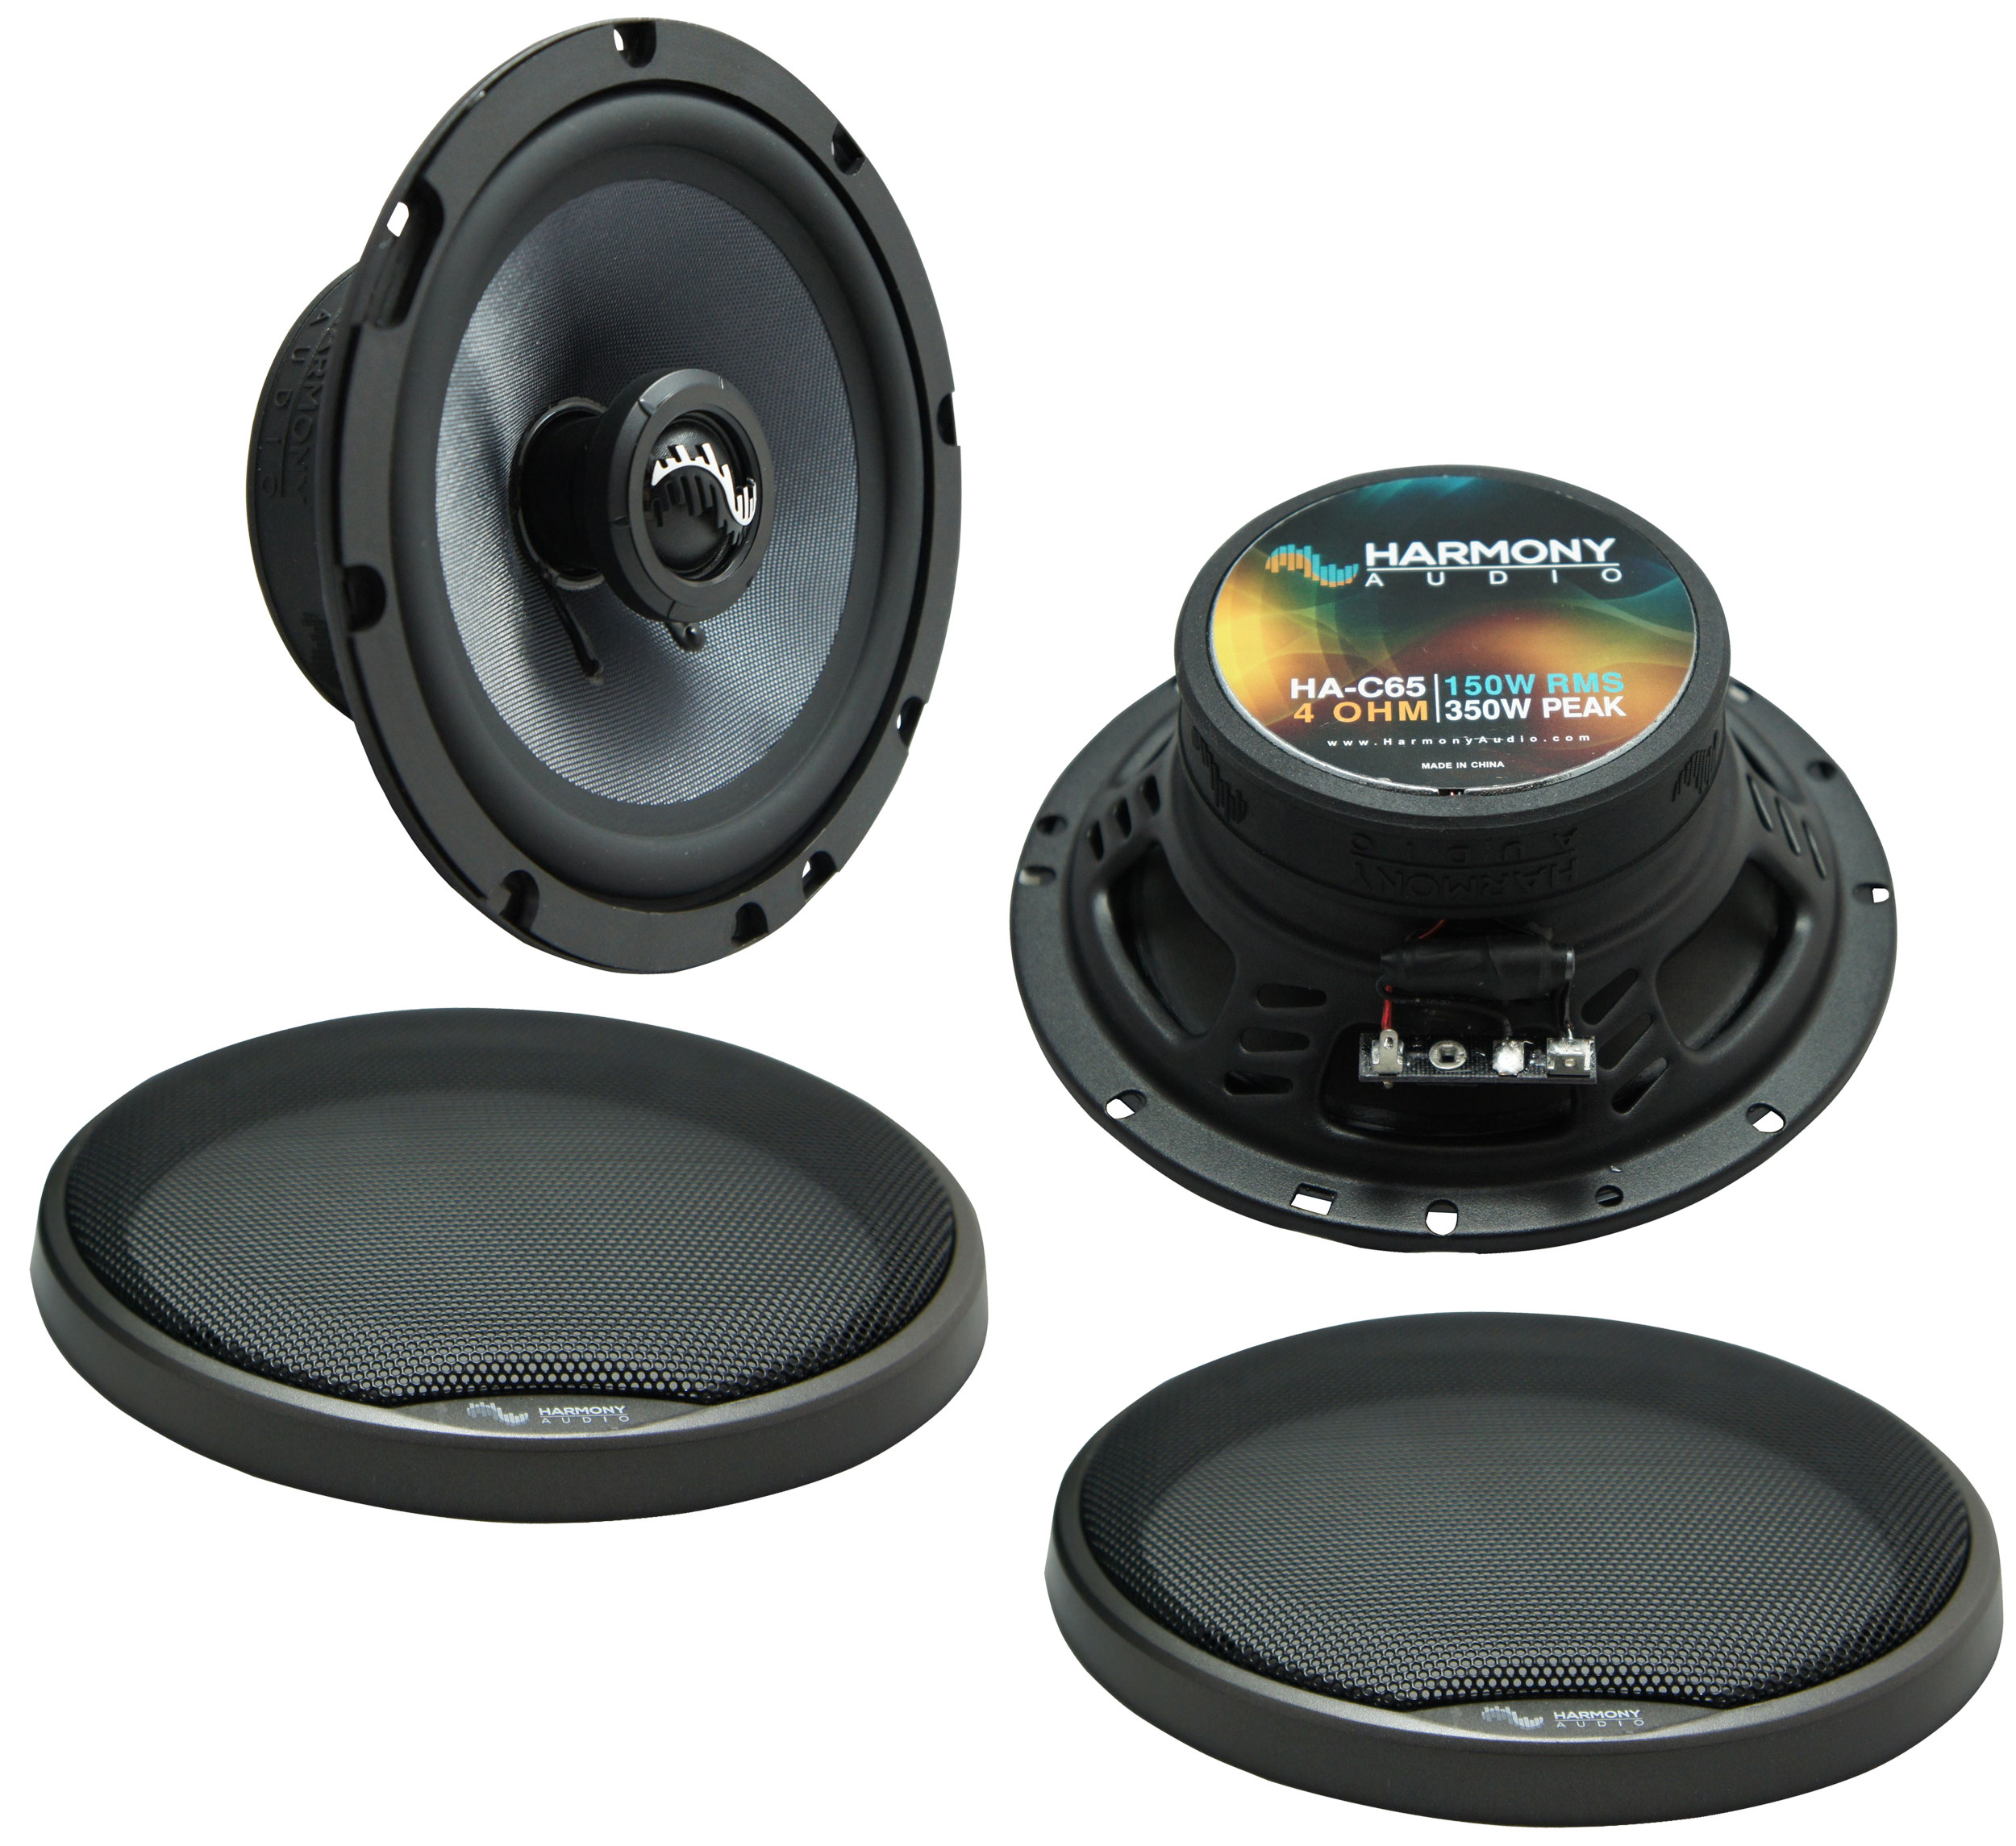 Fits Audi A4 1997-2009 Rear Door Replacement Speaker Harmony HA-C65 Premium Speakers